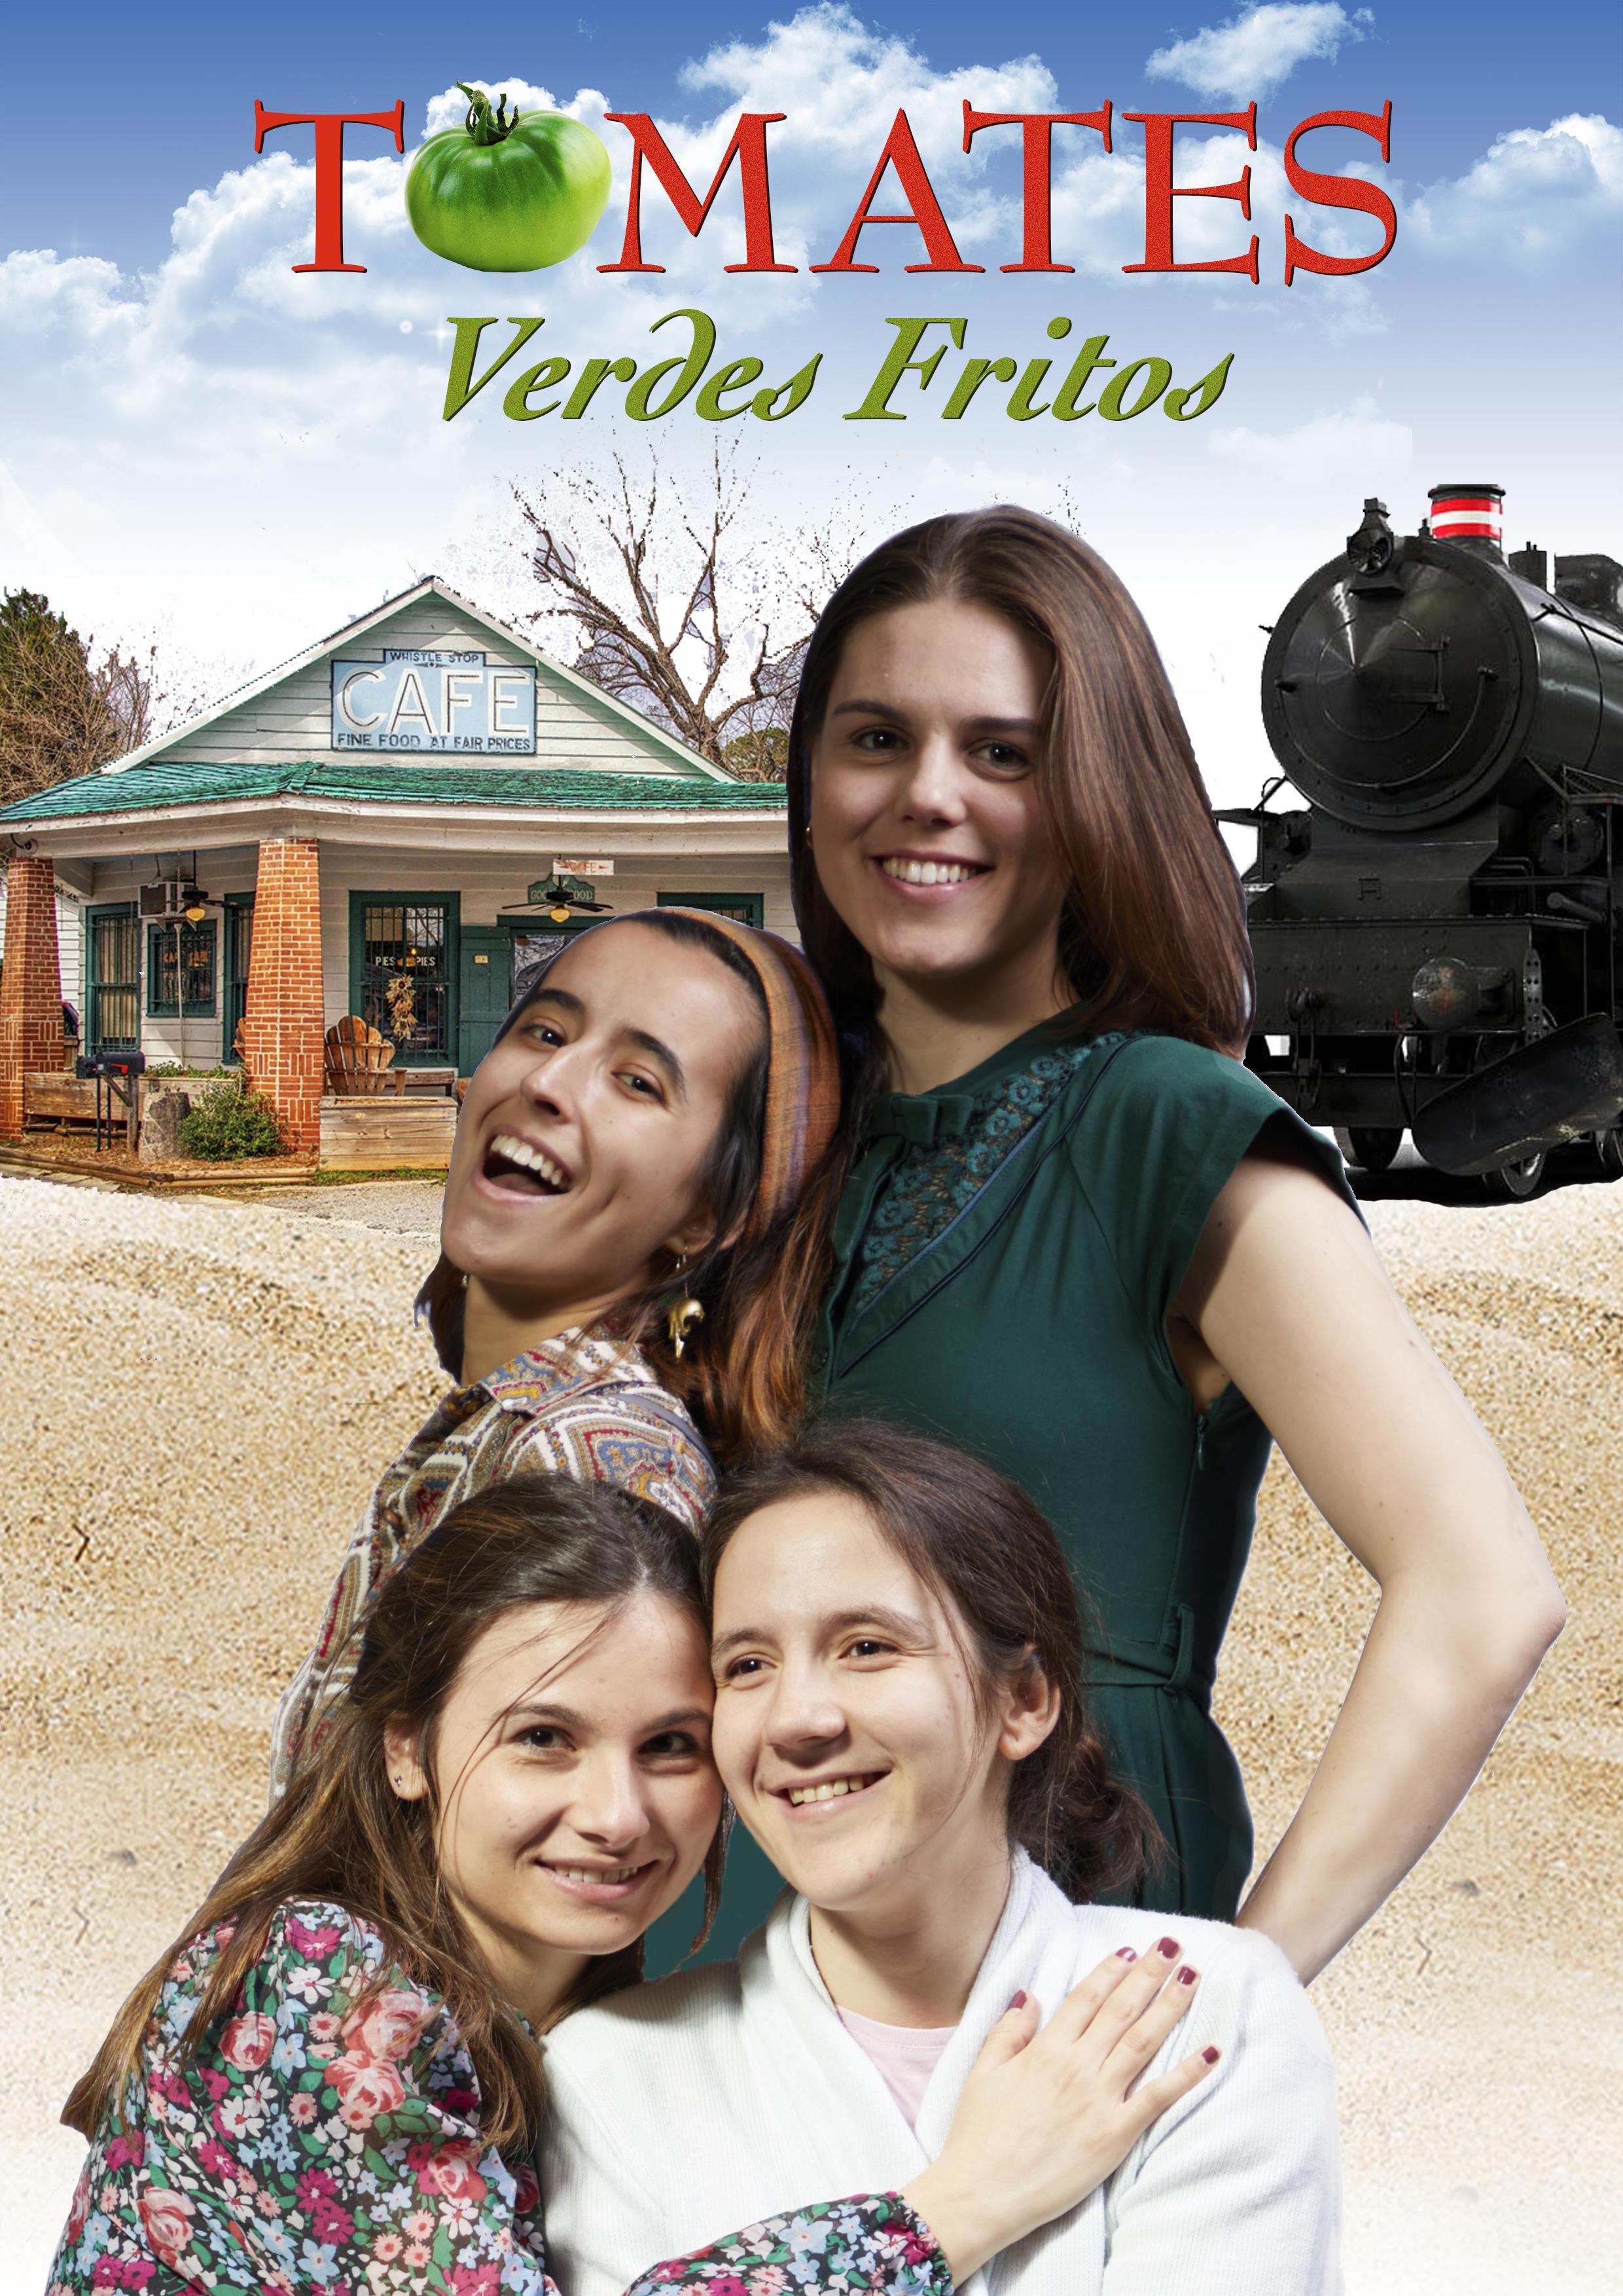 tomates-nodamoscredito-NDC-teatro-foto-cartel 2